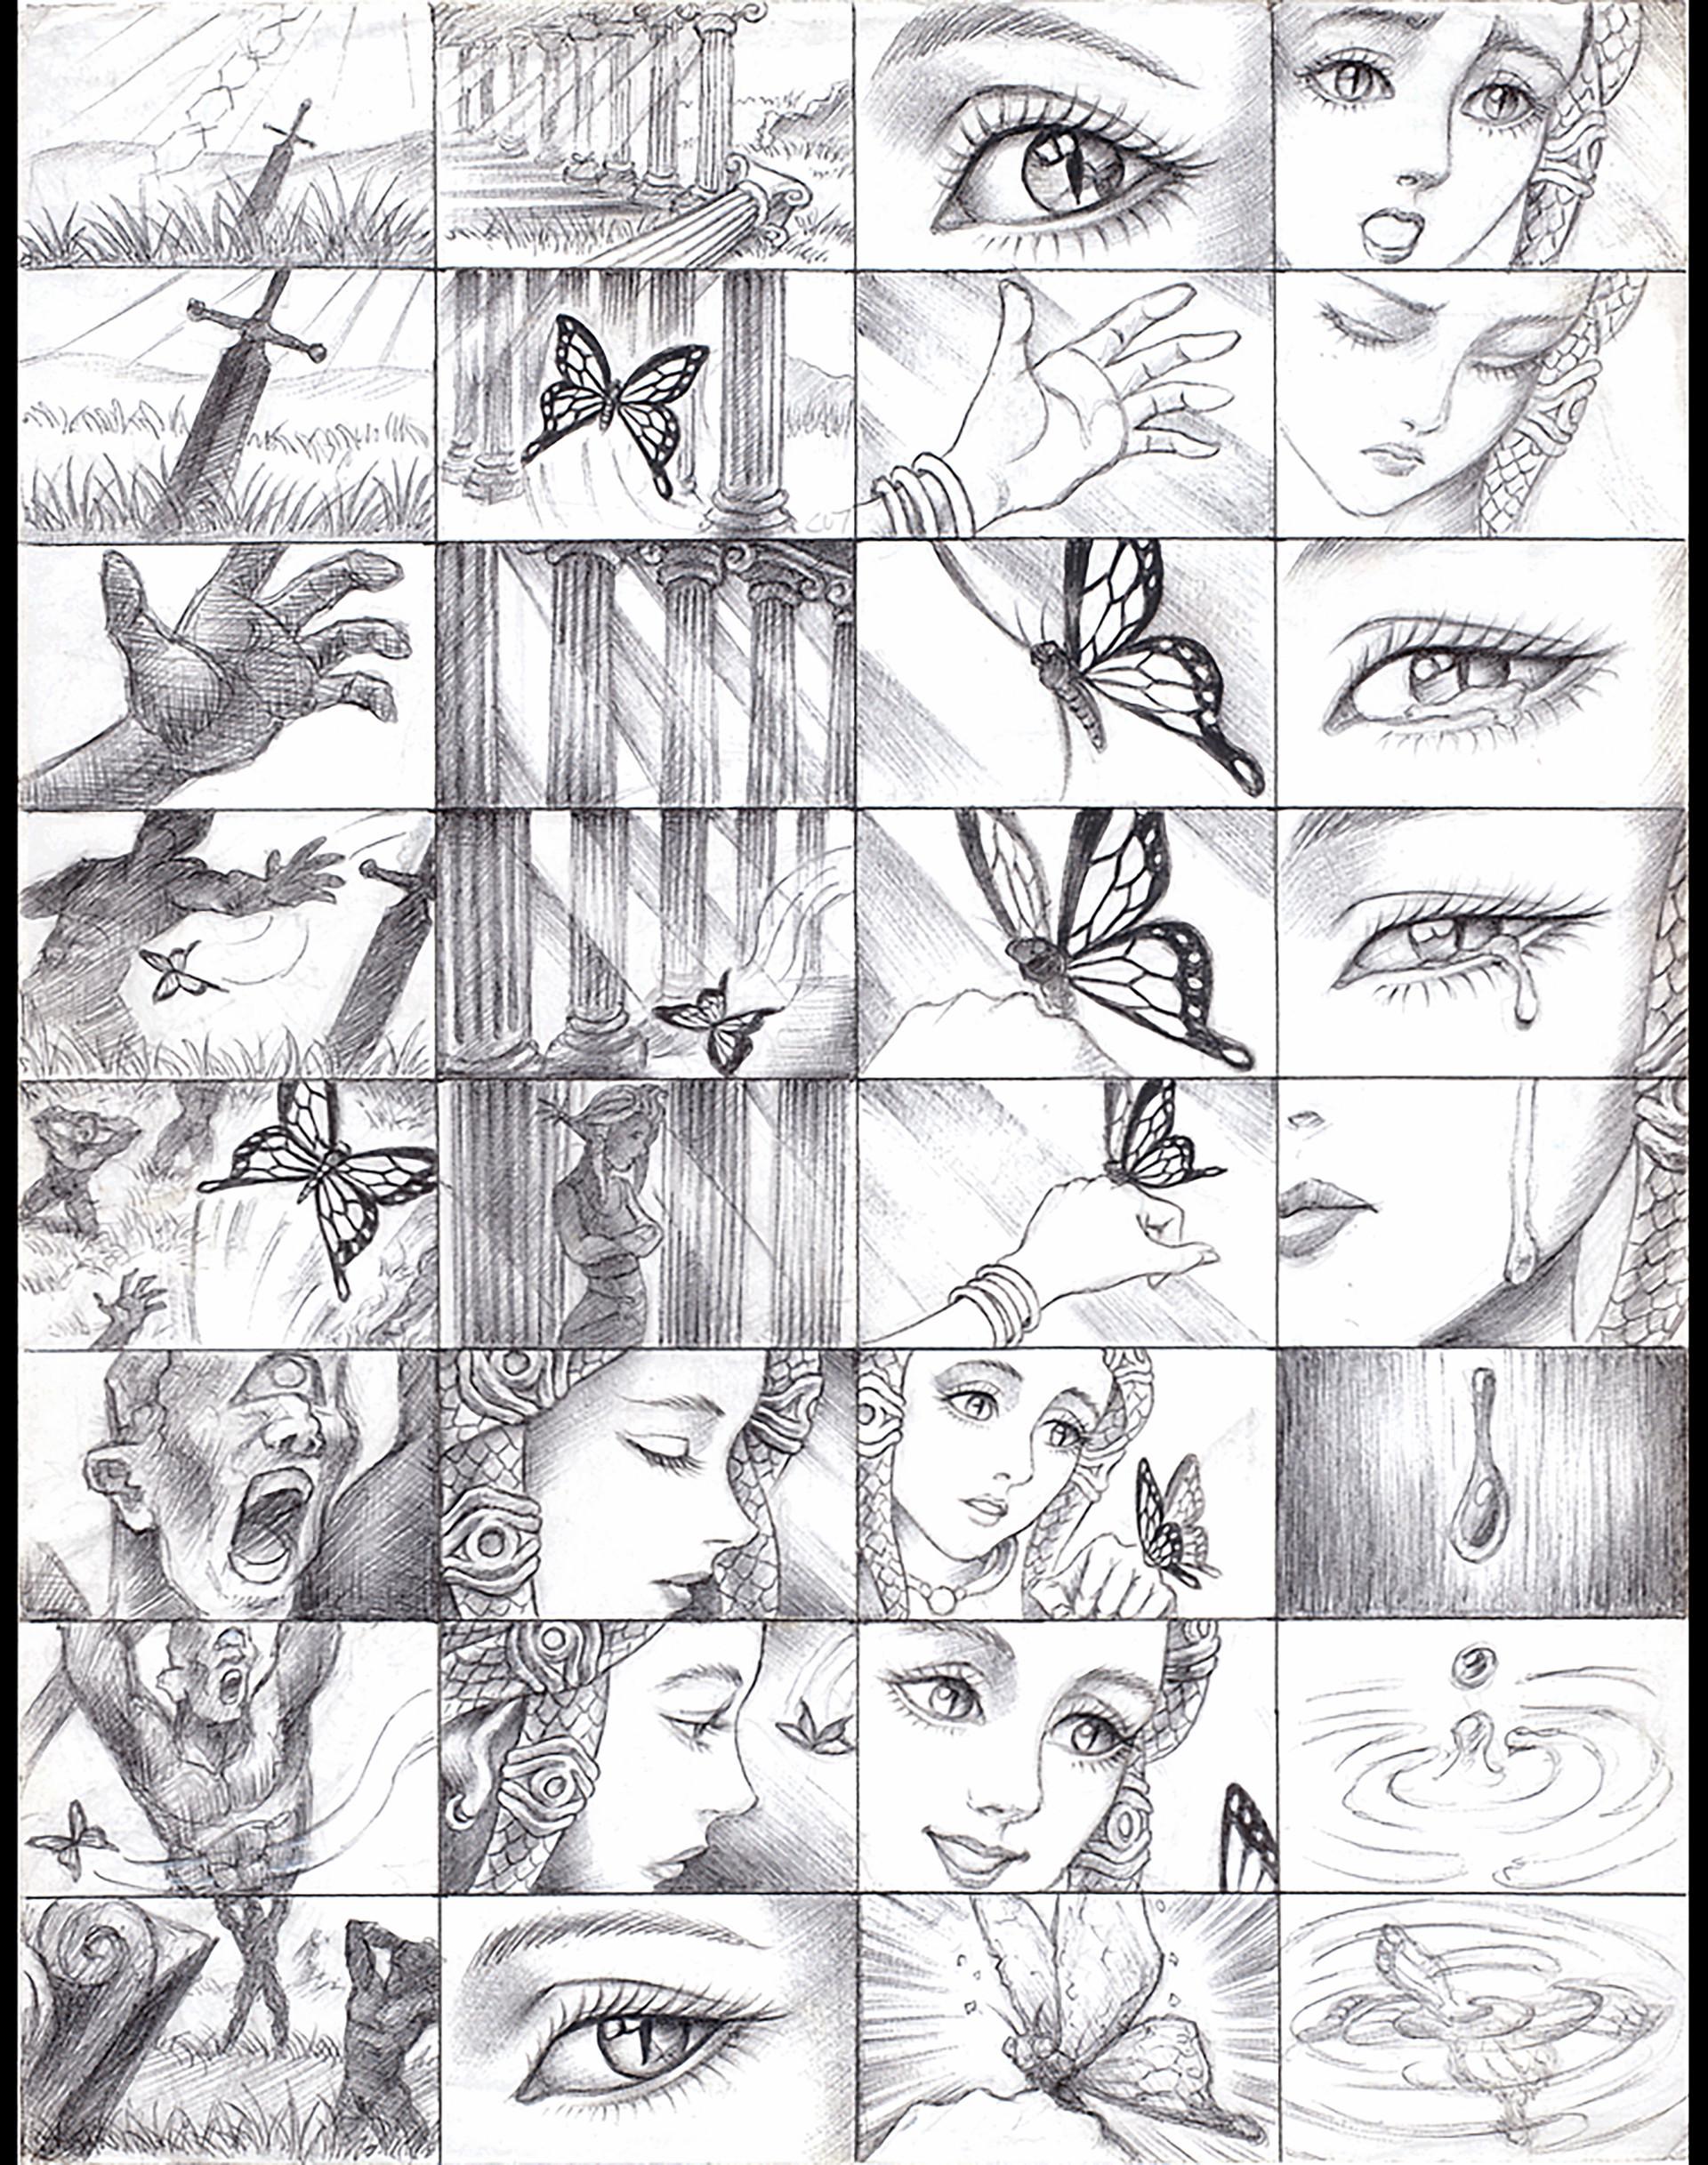 E lynx lin storyboard minna01